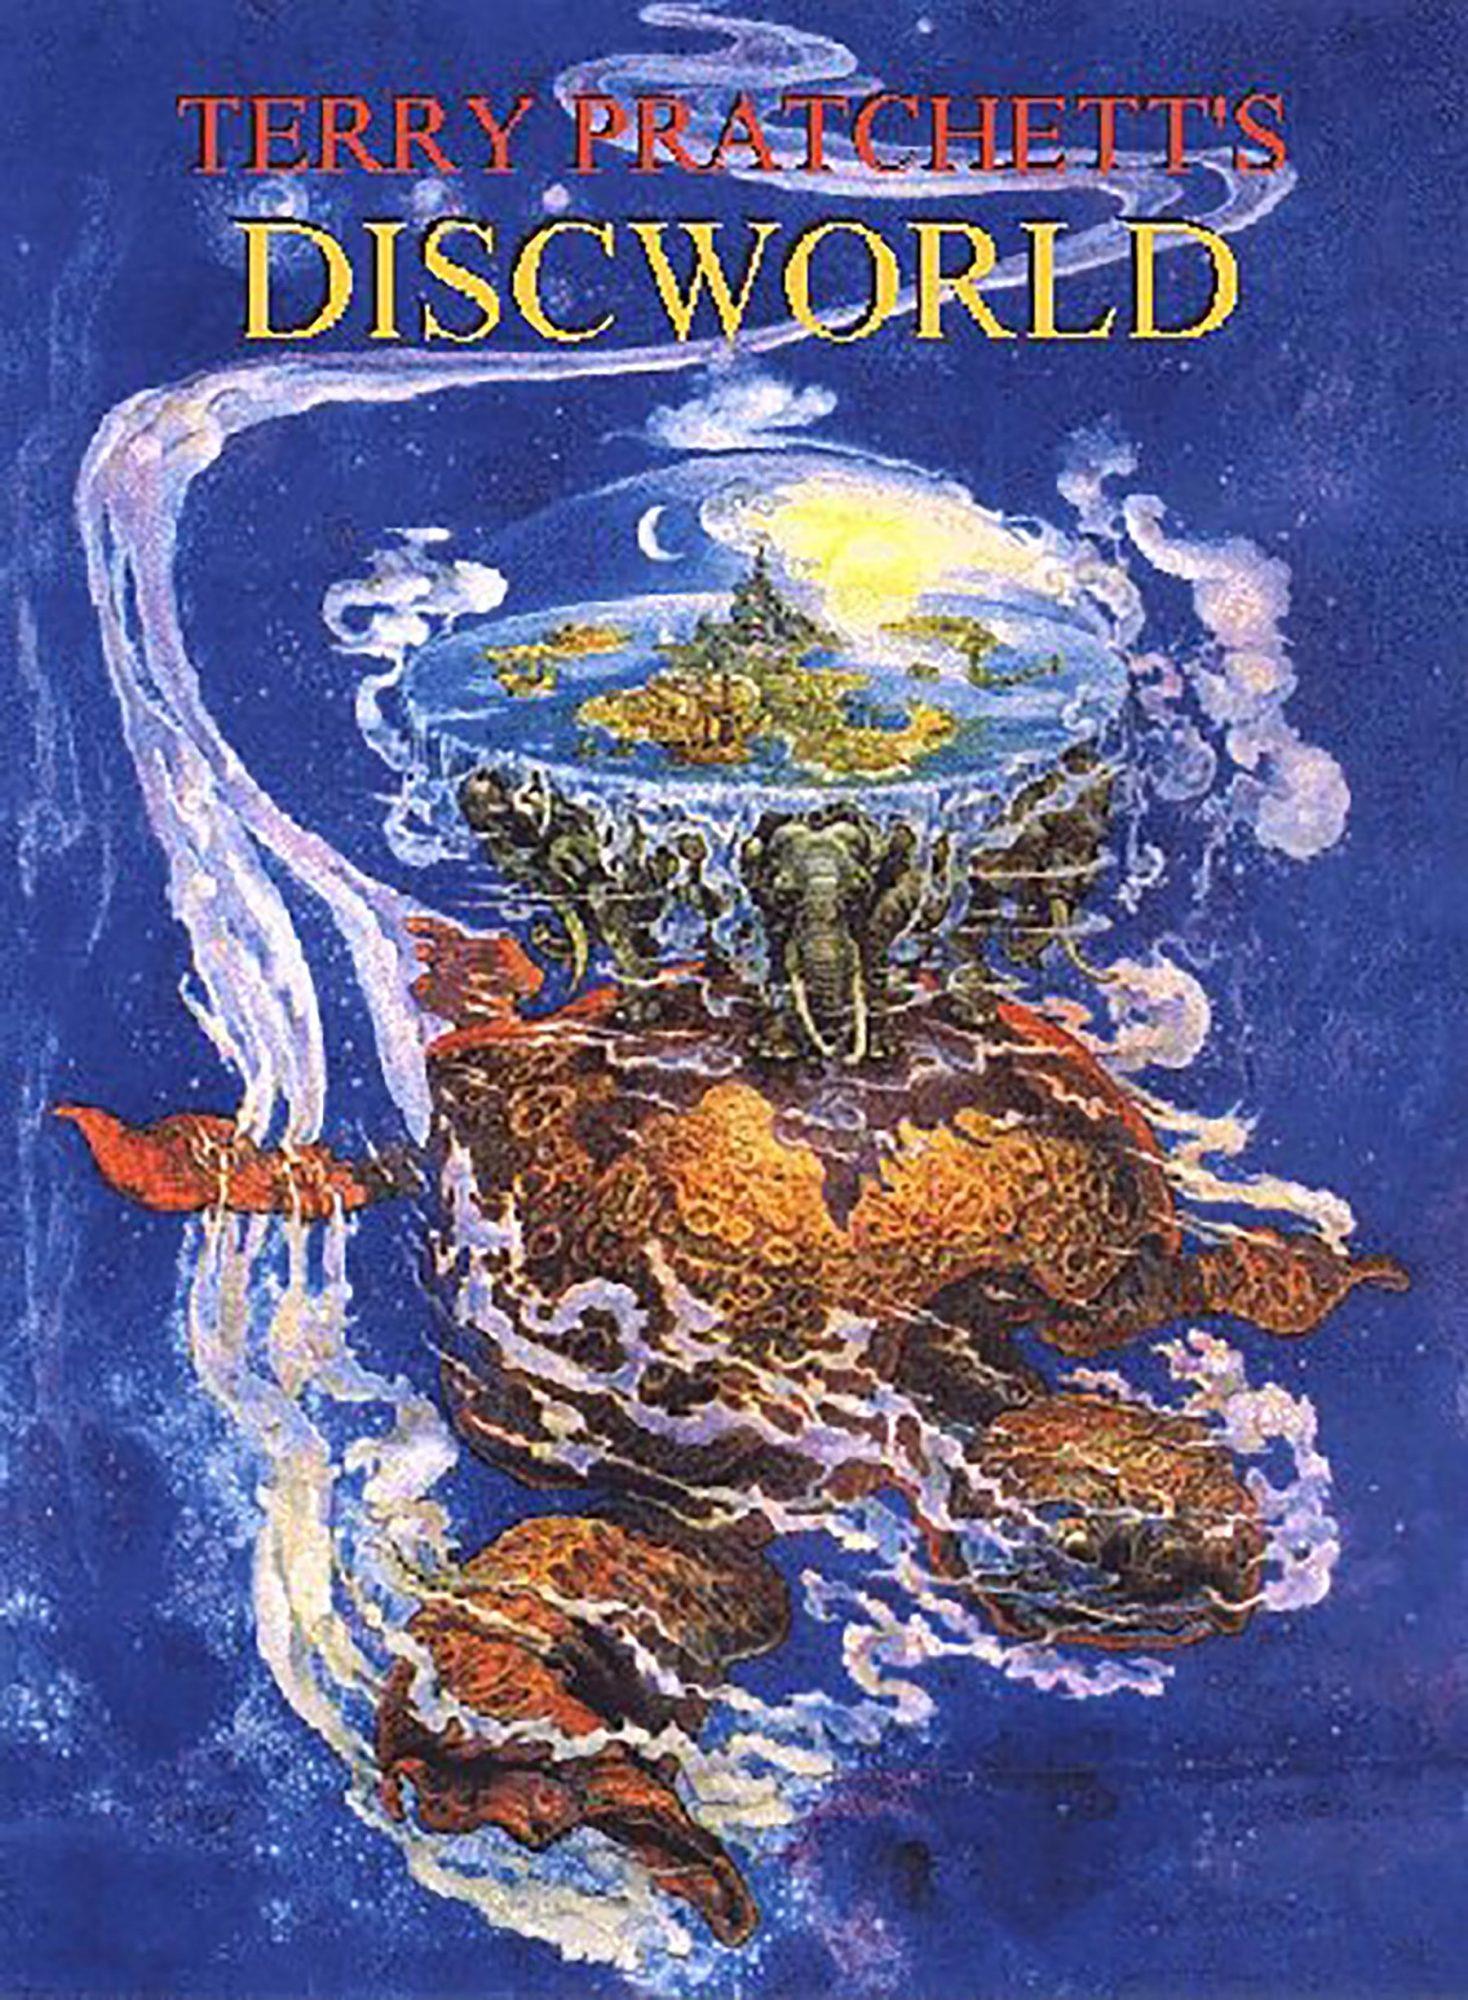 Terry Pratchett, Discworld